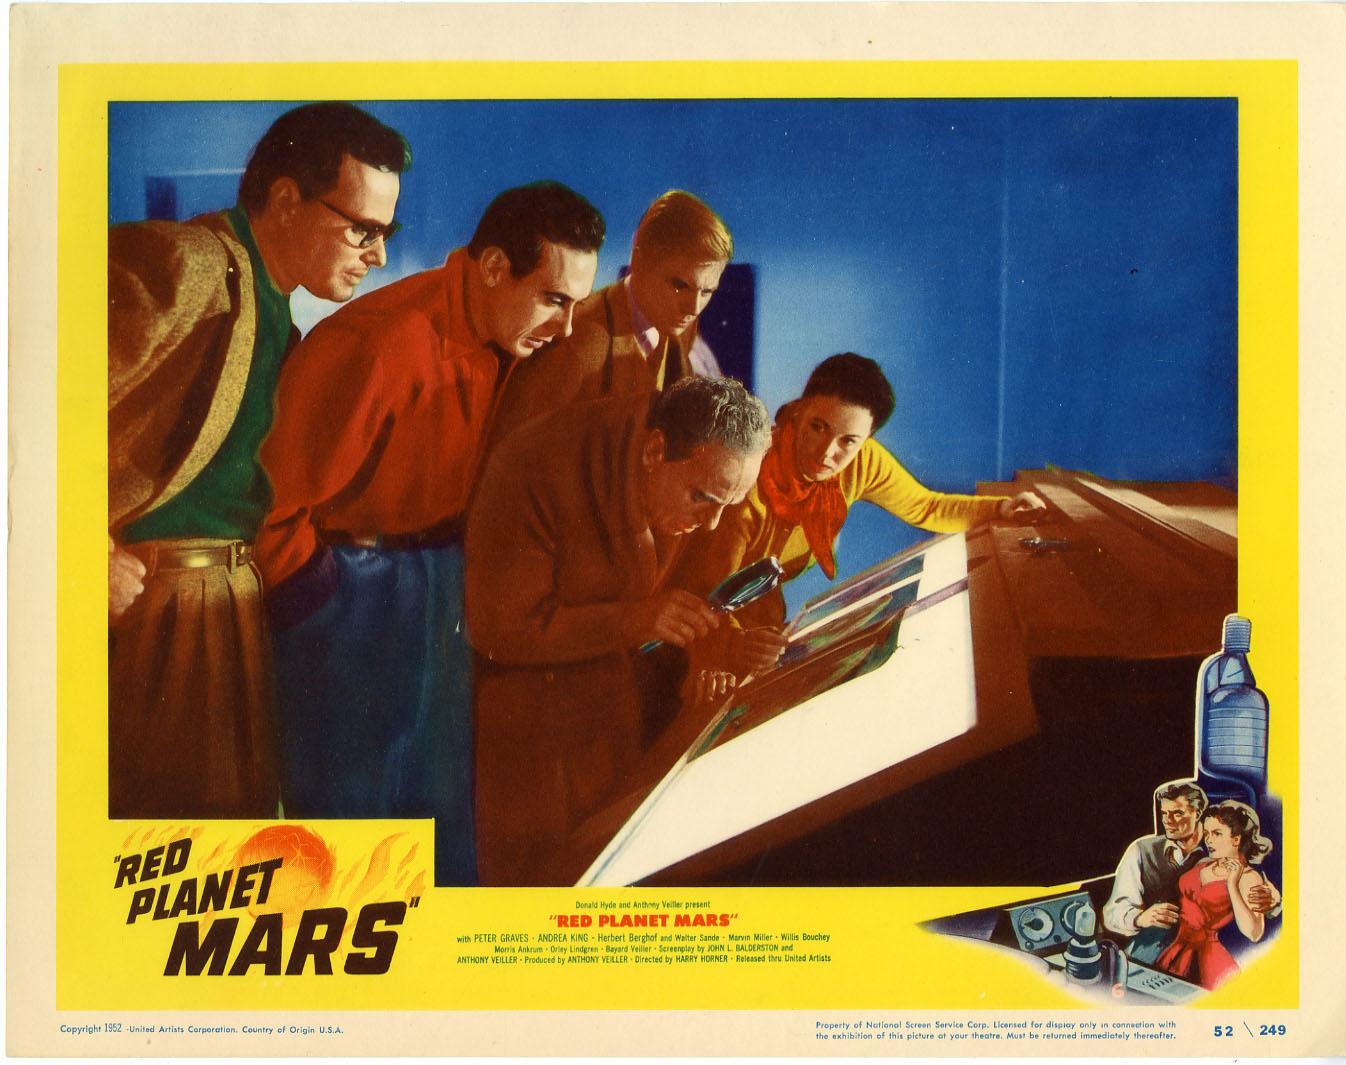 red planet mars lobby card